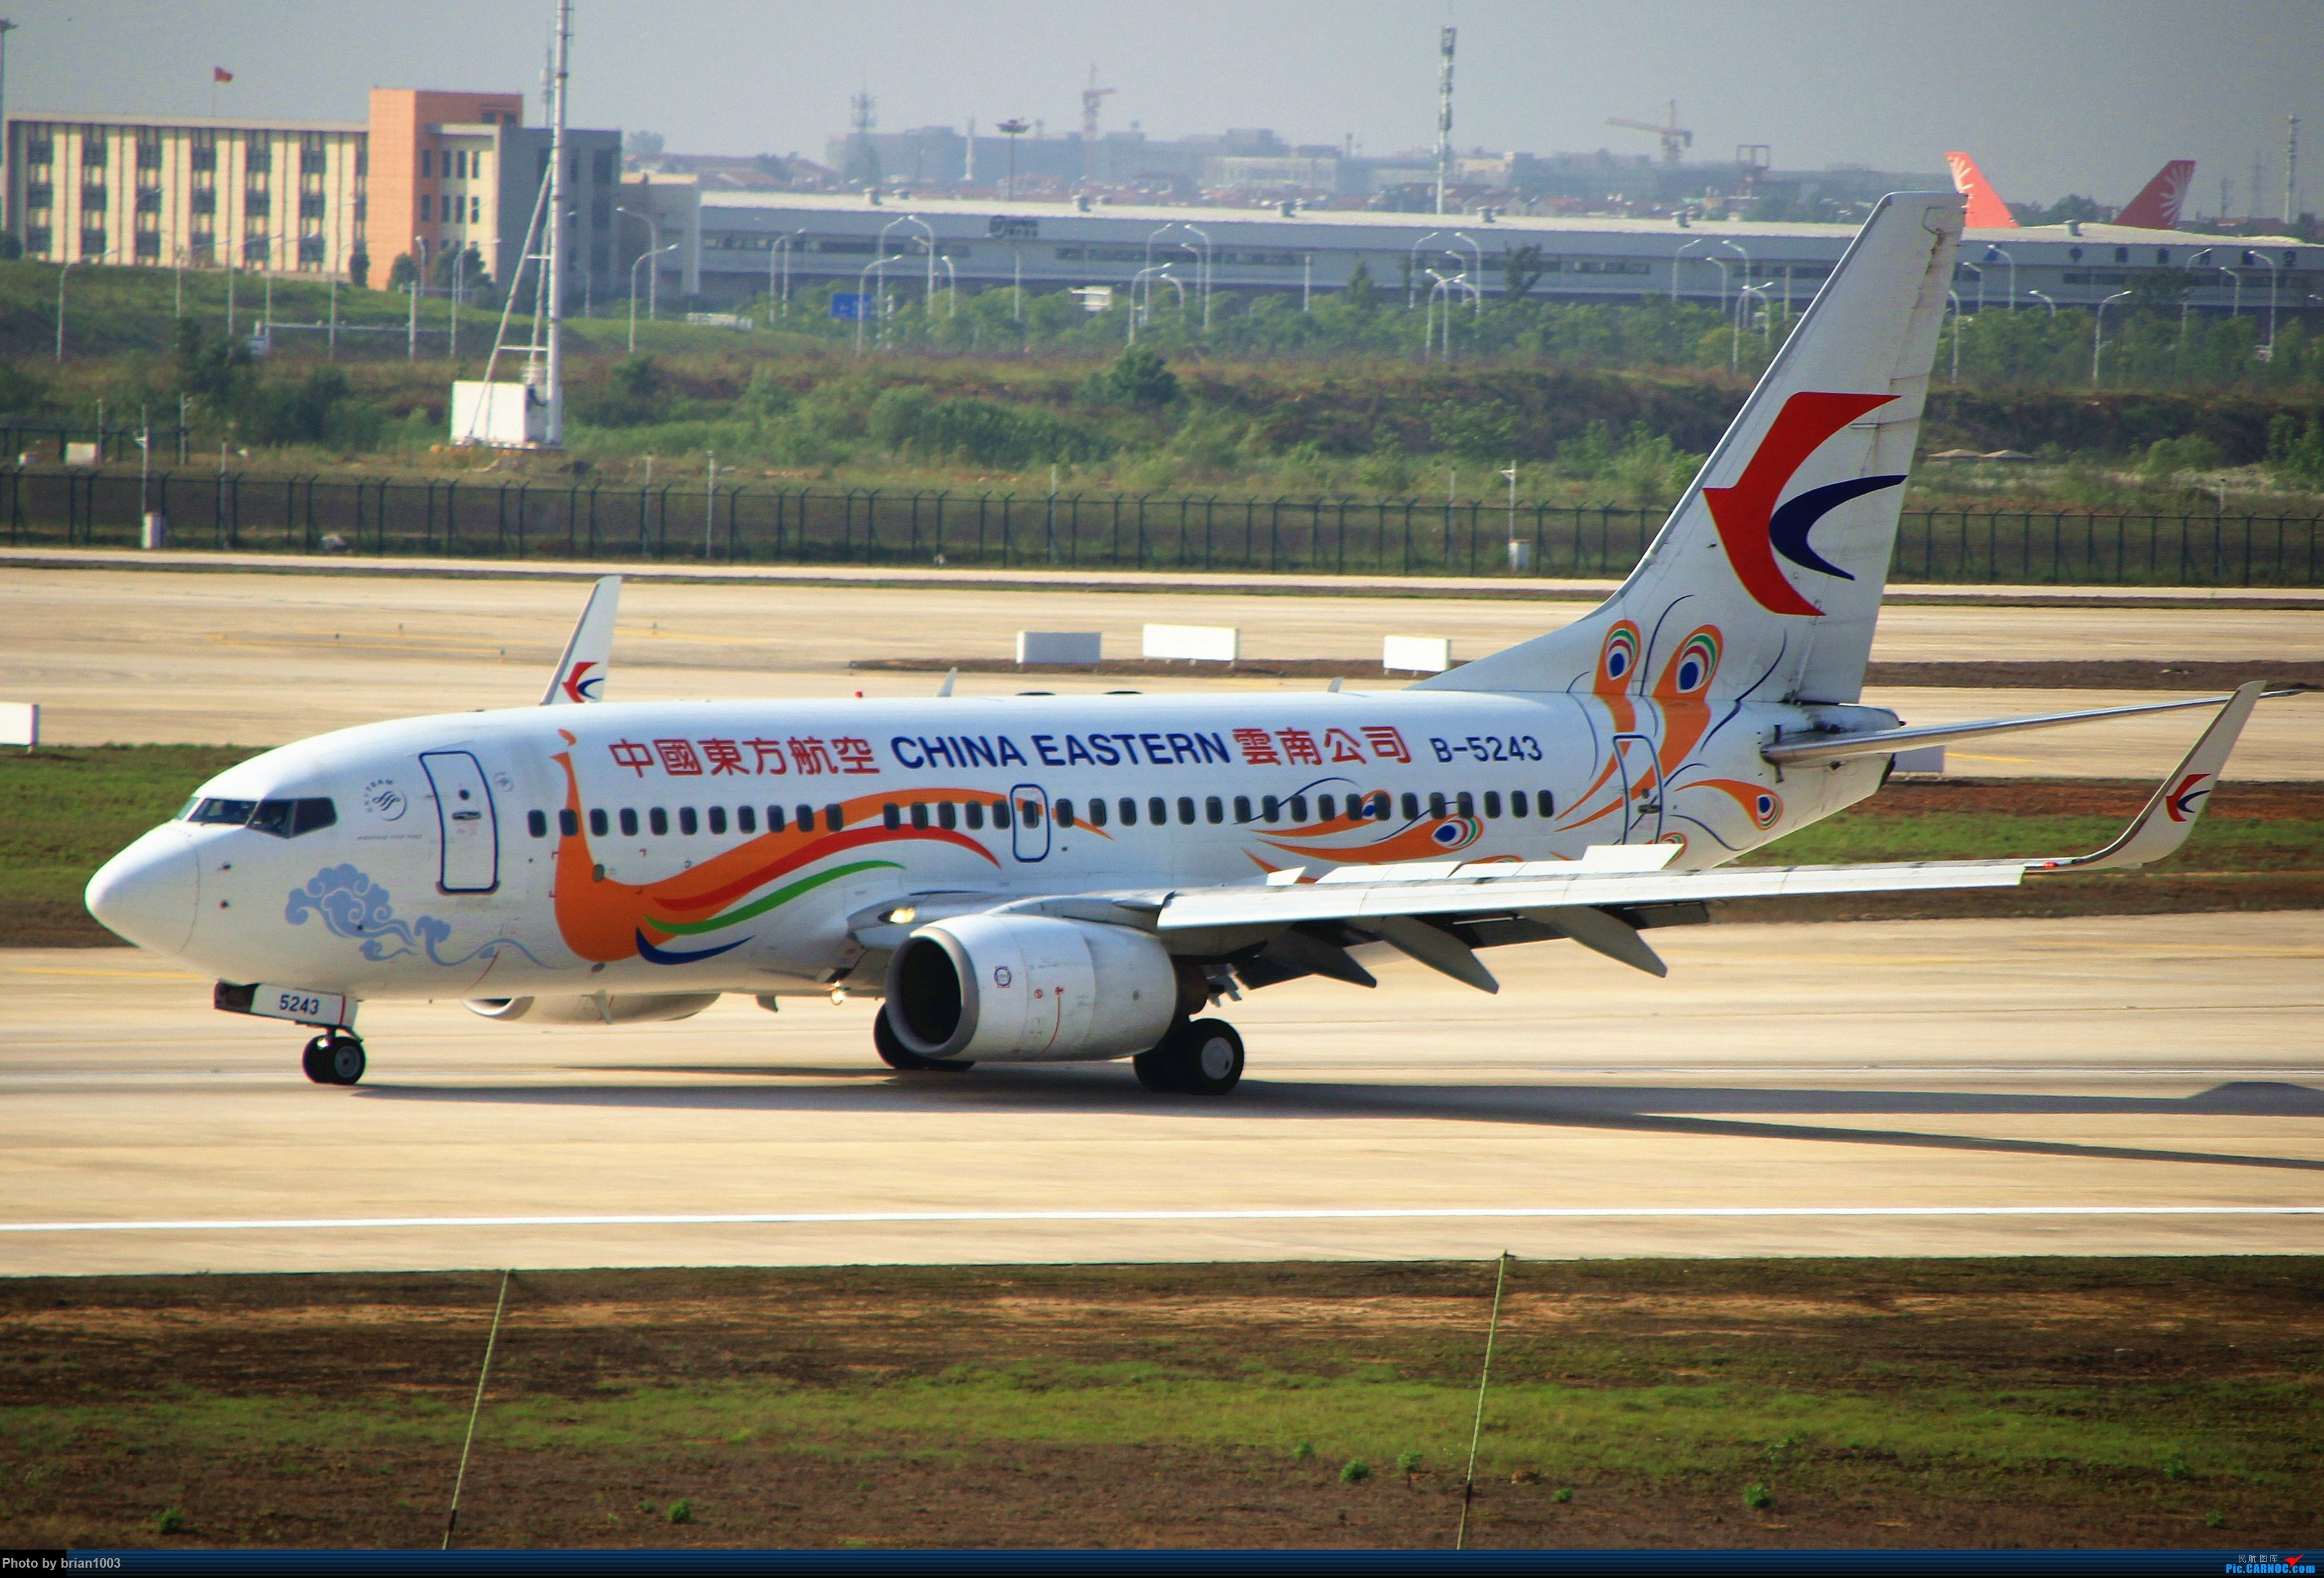 Re:WUH武汉天河机场拍机之喜迎酷航788和偶遇某其他飞机 BOEING 737-700 B-5243